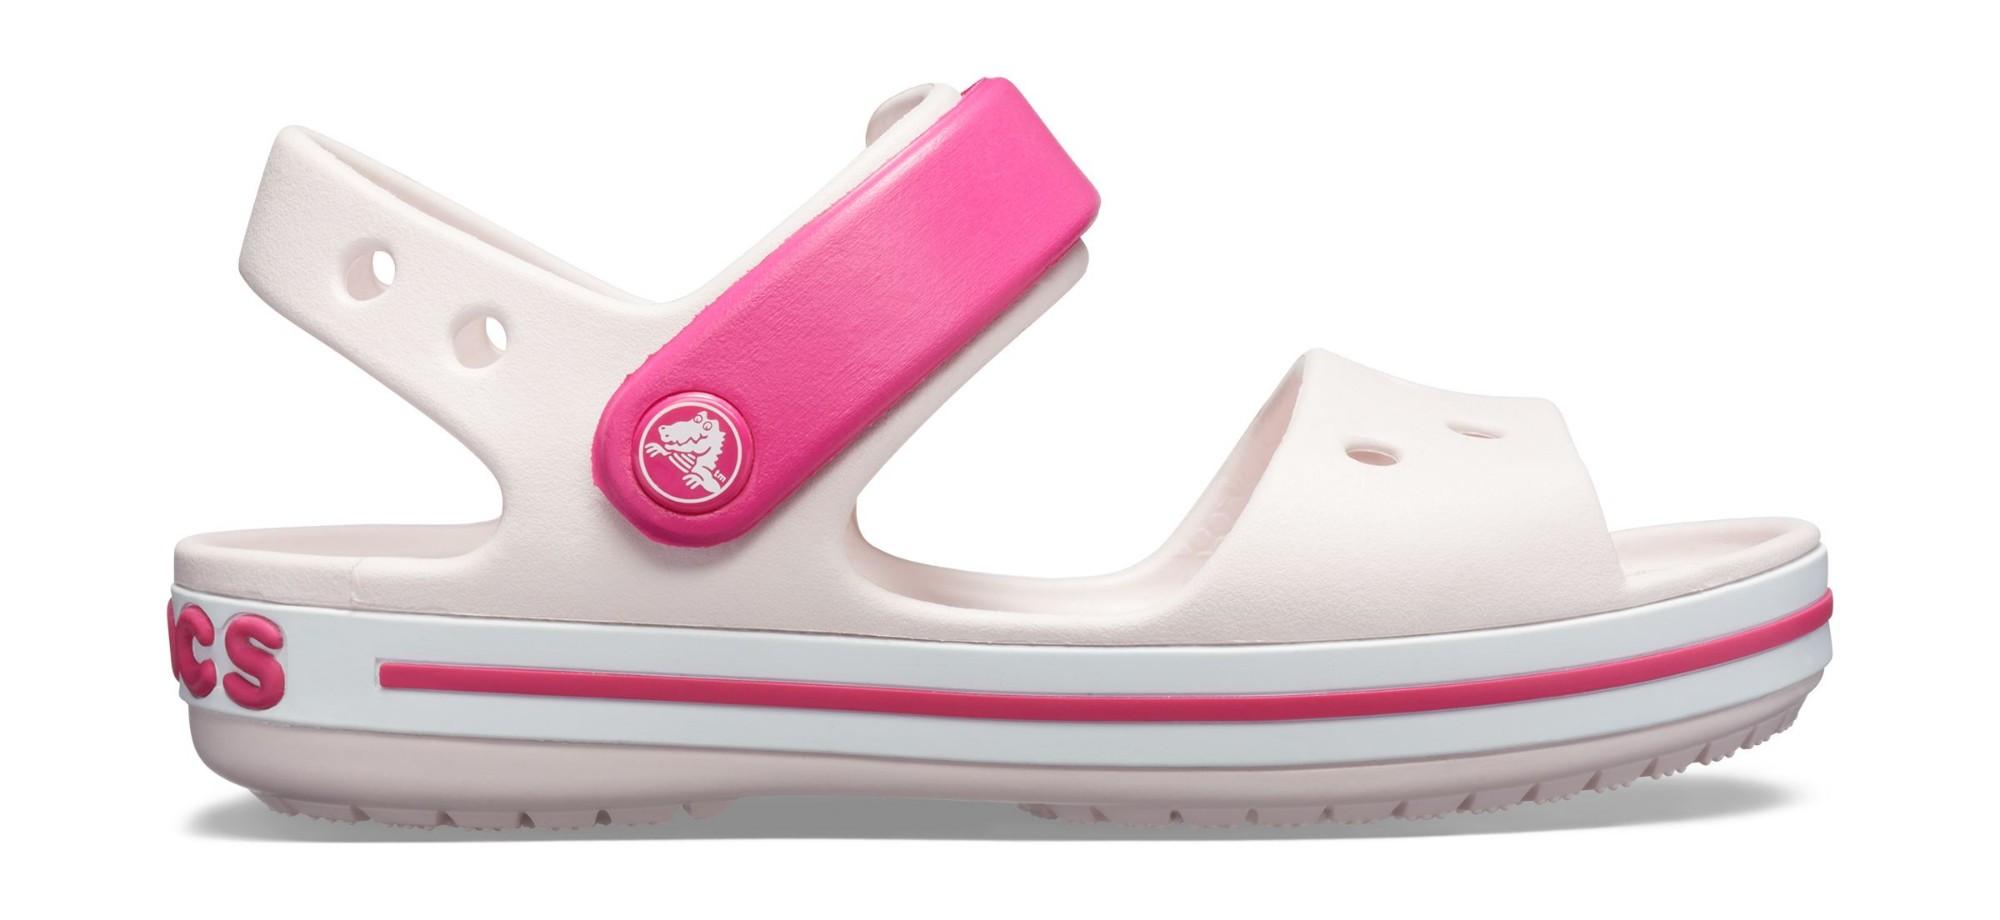 Crocs™ Kids' Crocband Sandal Barely Pink/Candy Pink 32